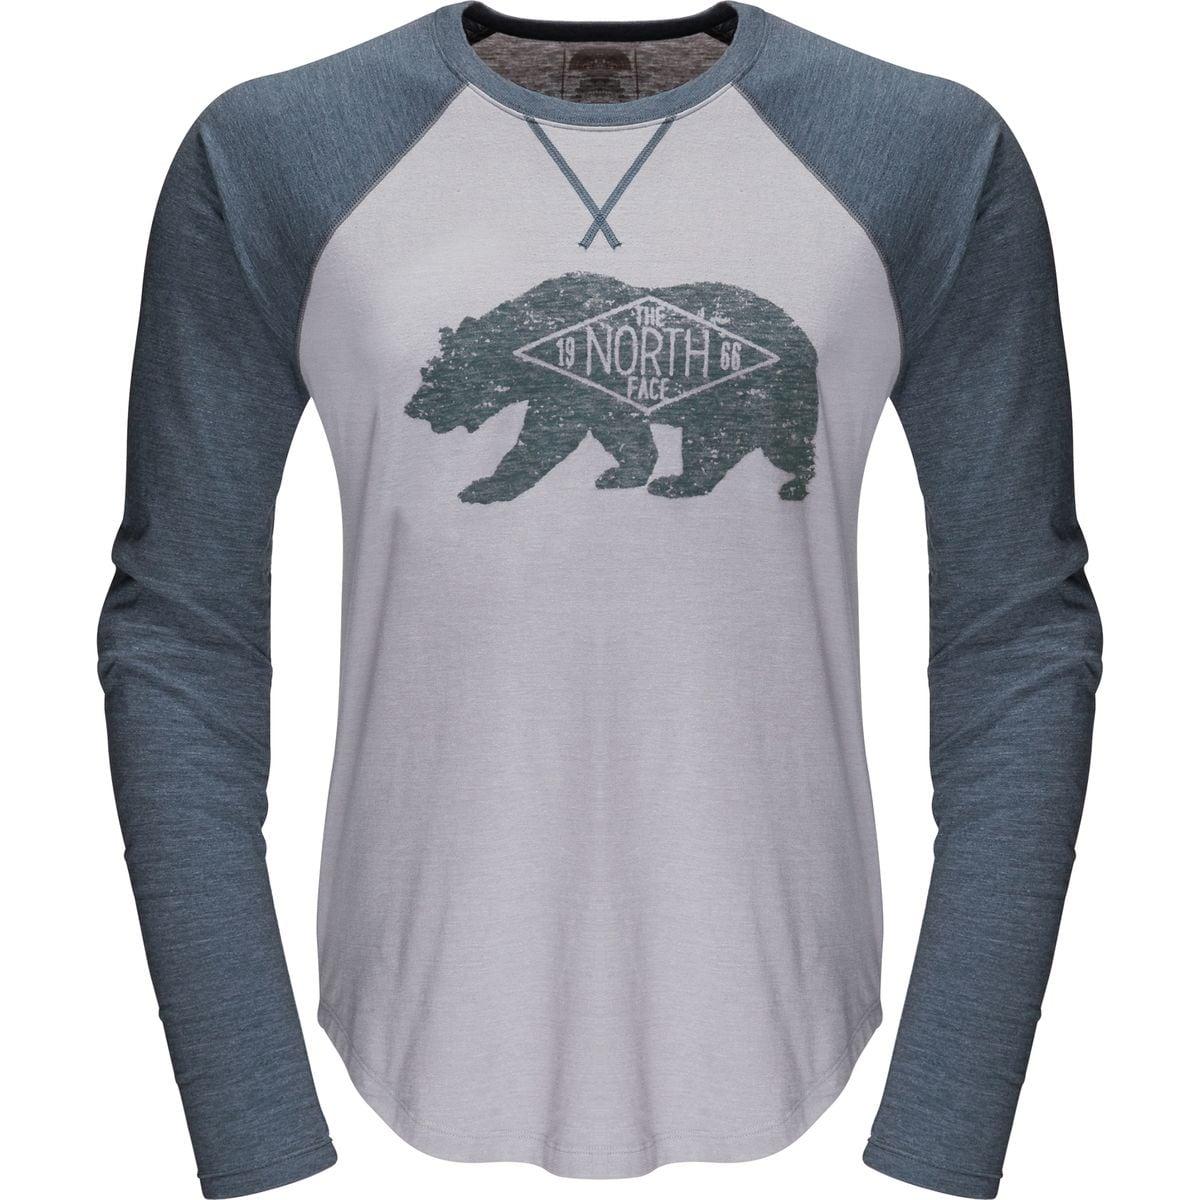 The North Face Bearitage Baseball T-Shirt - Long-Sleeve - Men